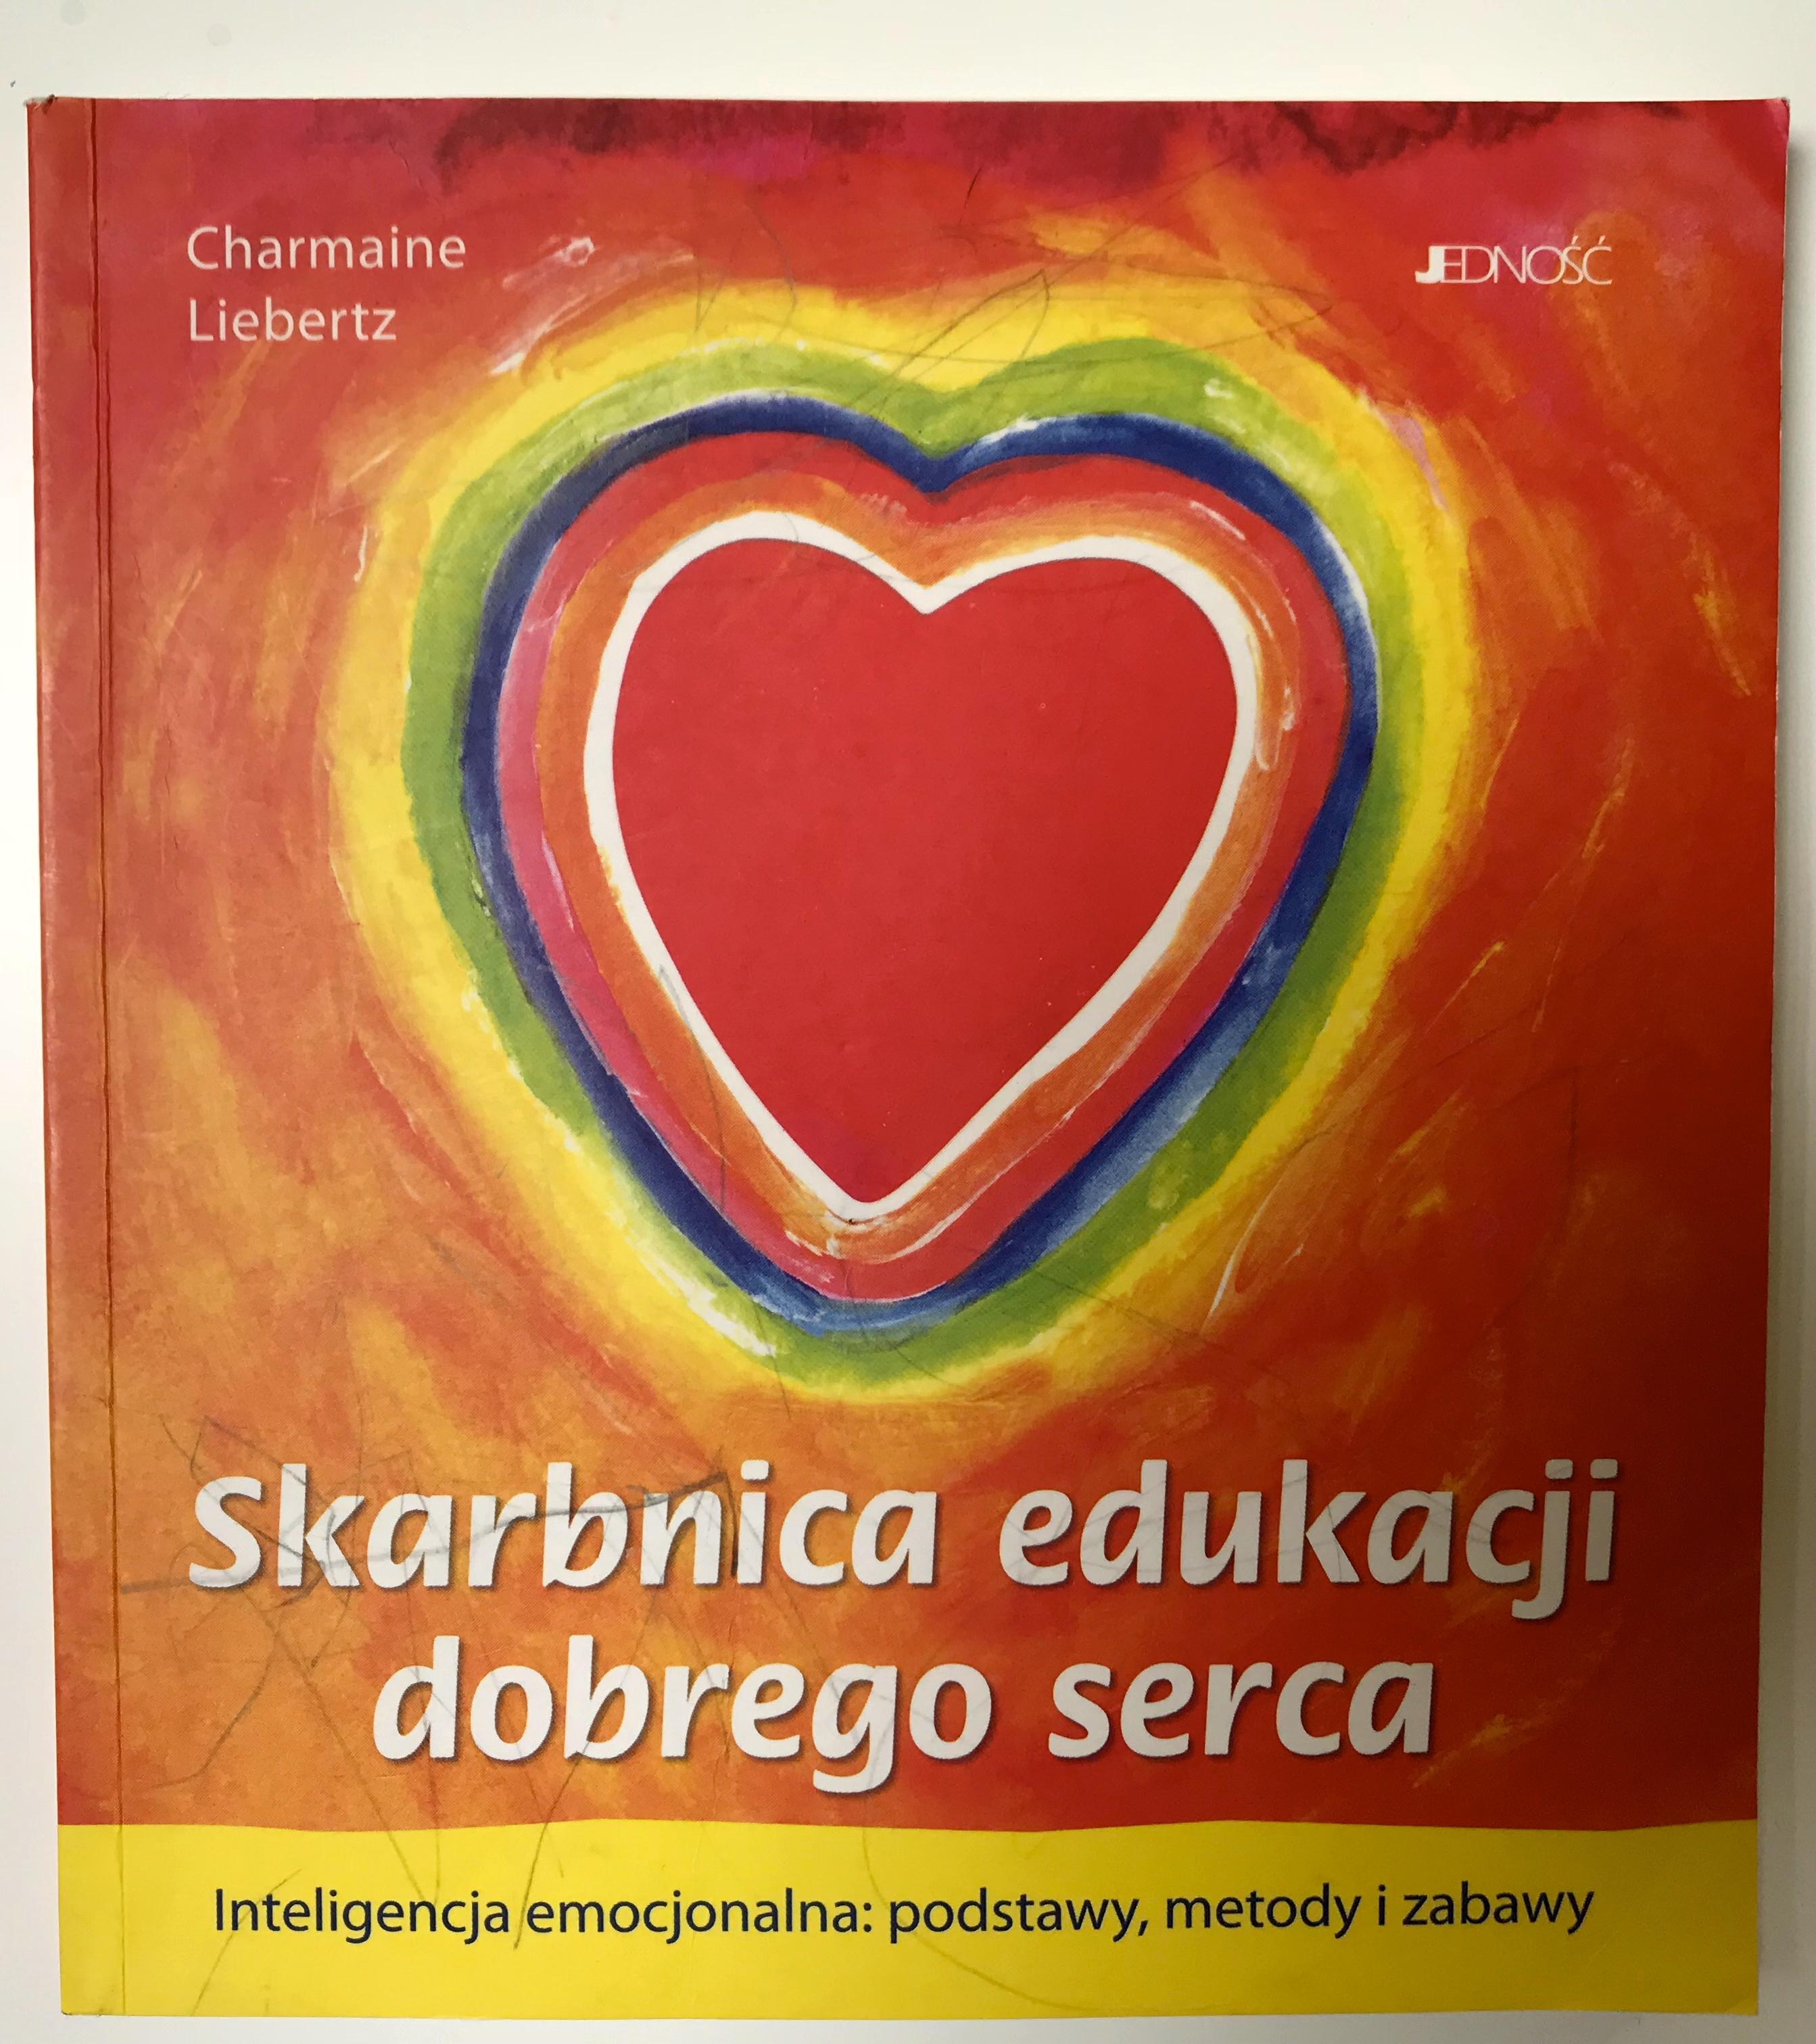 Skarbnica edukacji dobrego serca – mała książka o dużym potencjale.